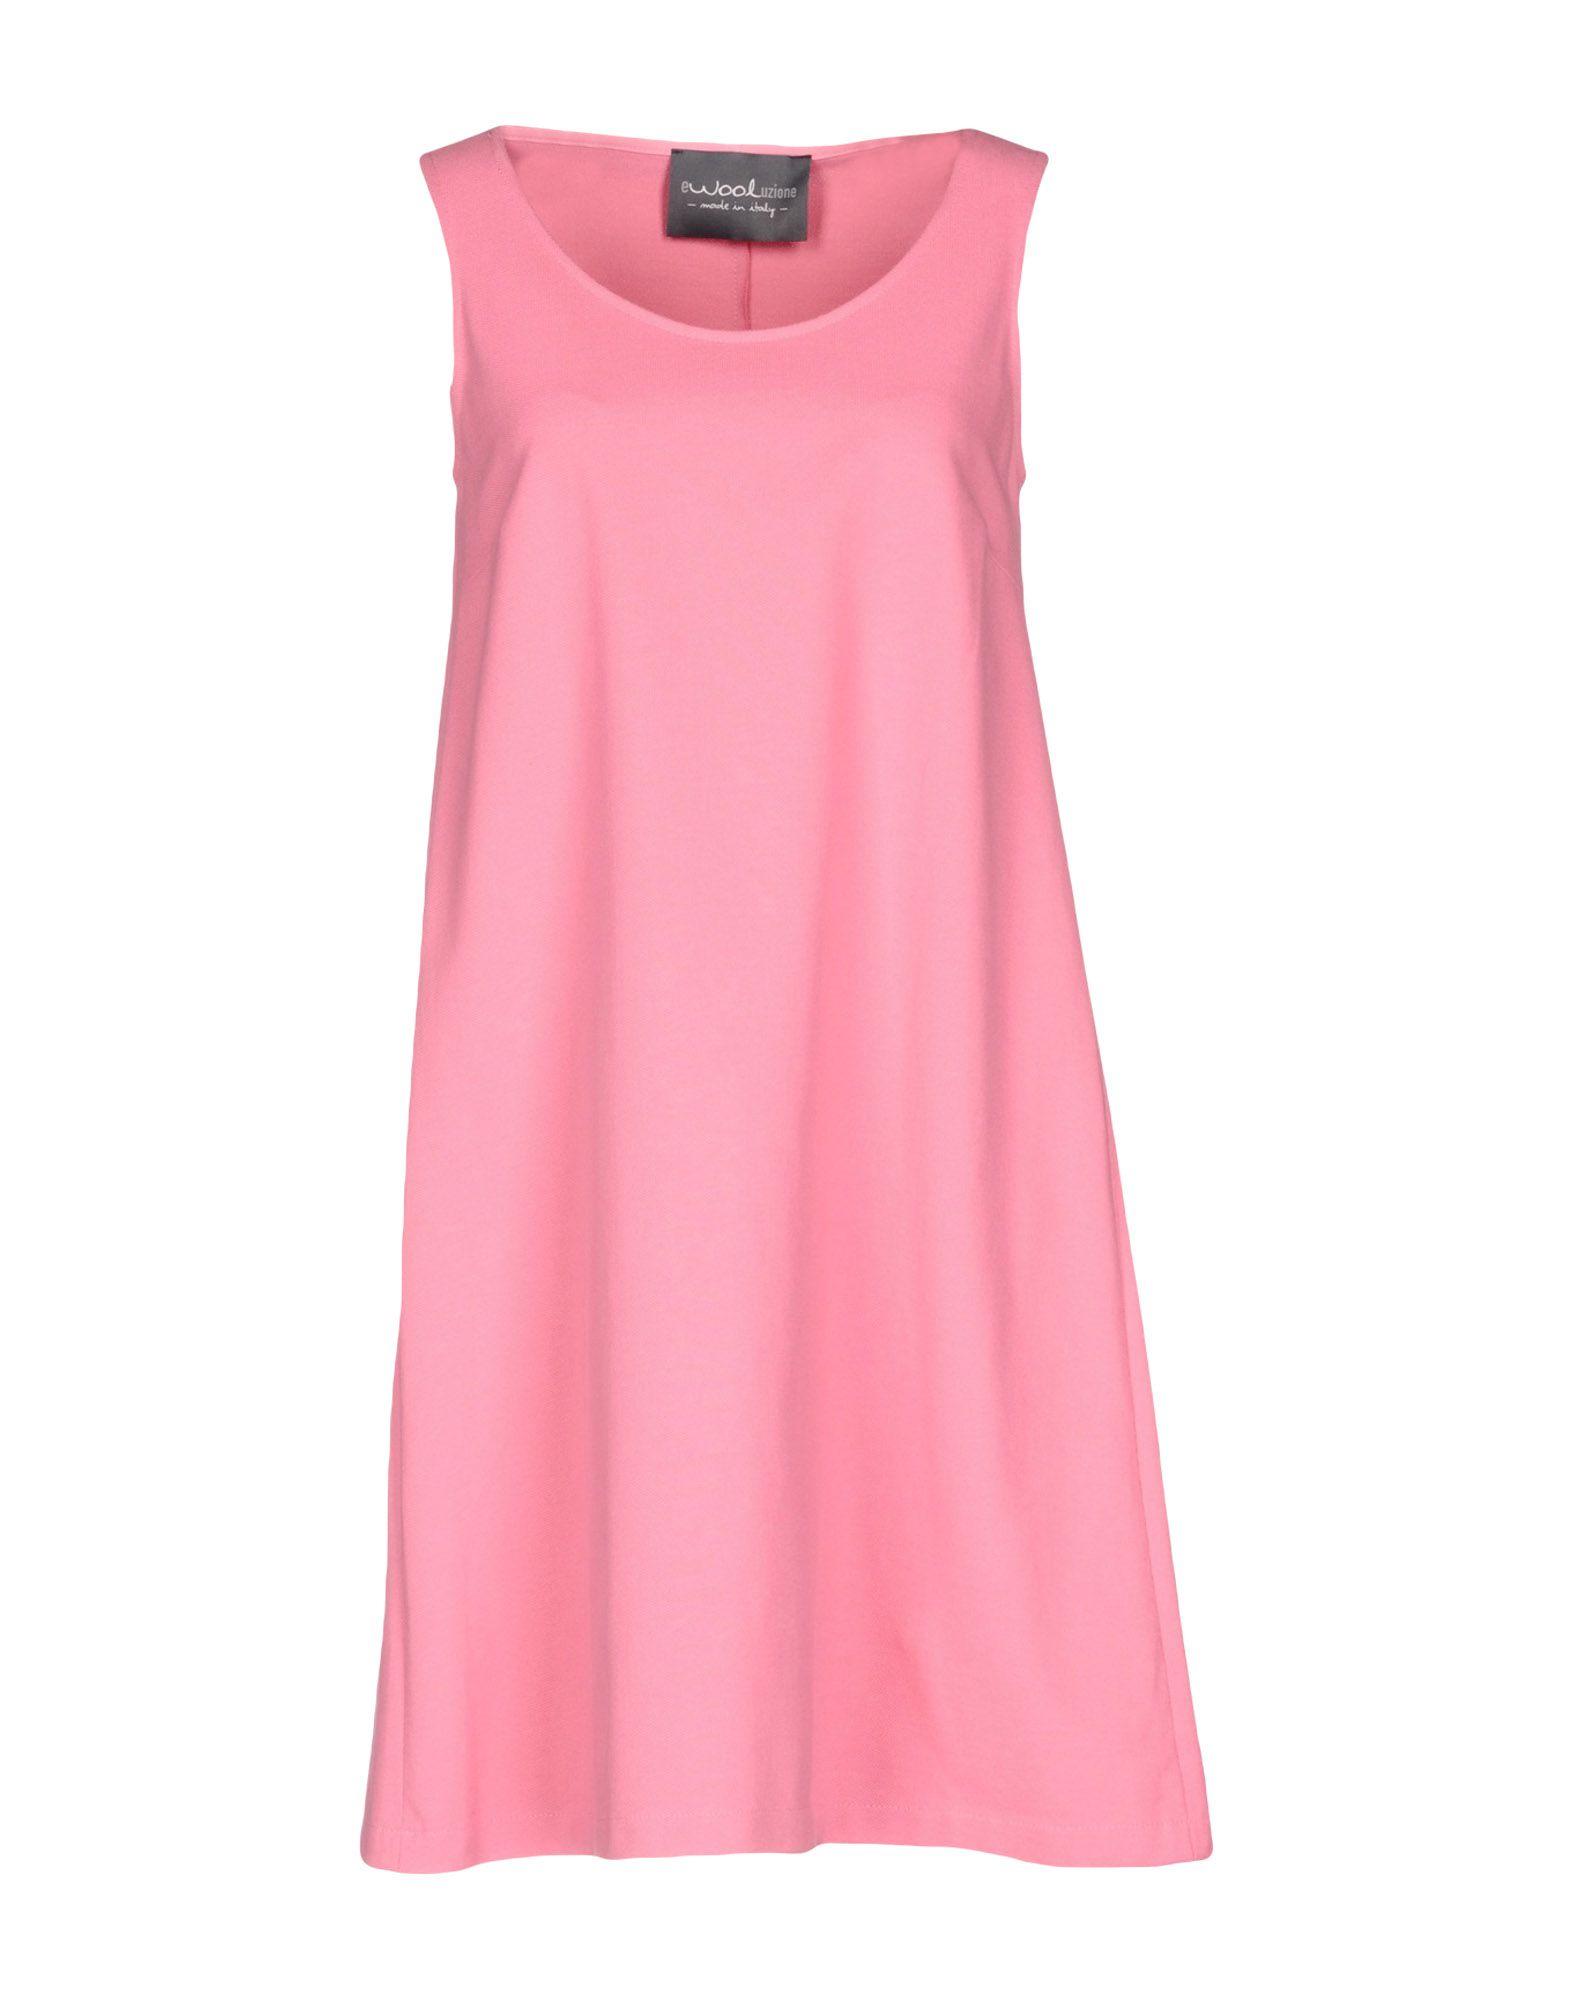 EWOOLUZIONE | EWOOLuzione Short dresses 34798239 | Goxip